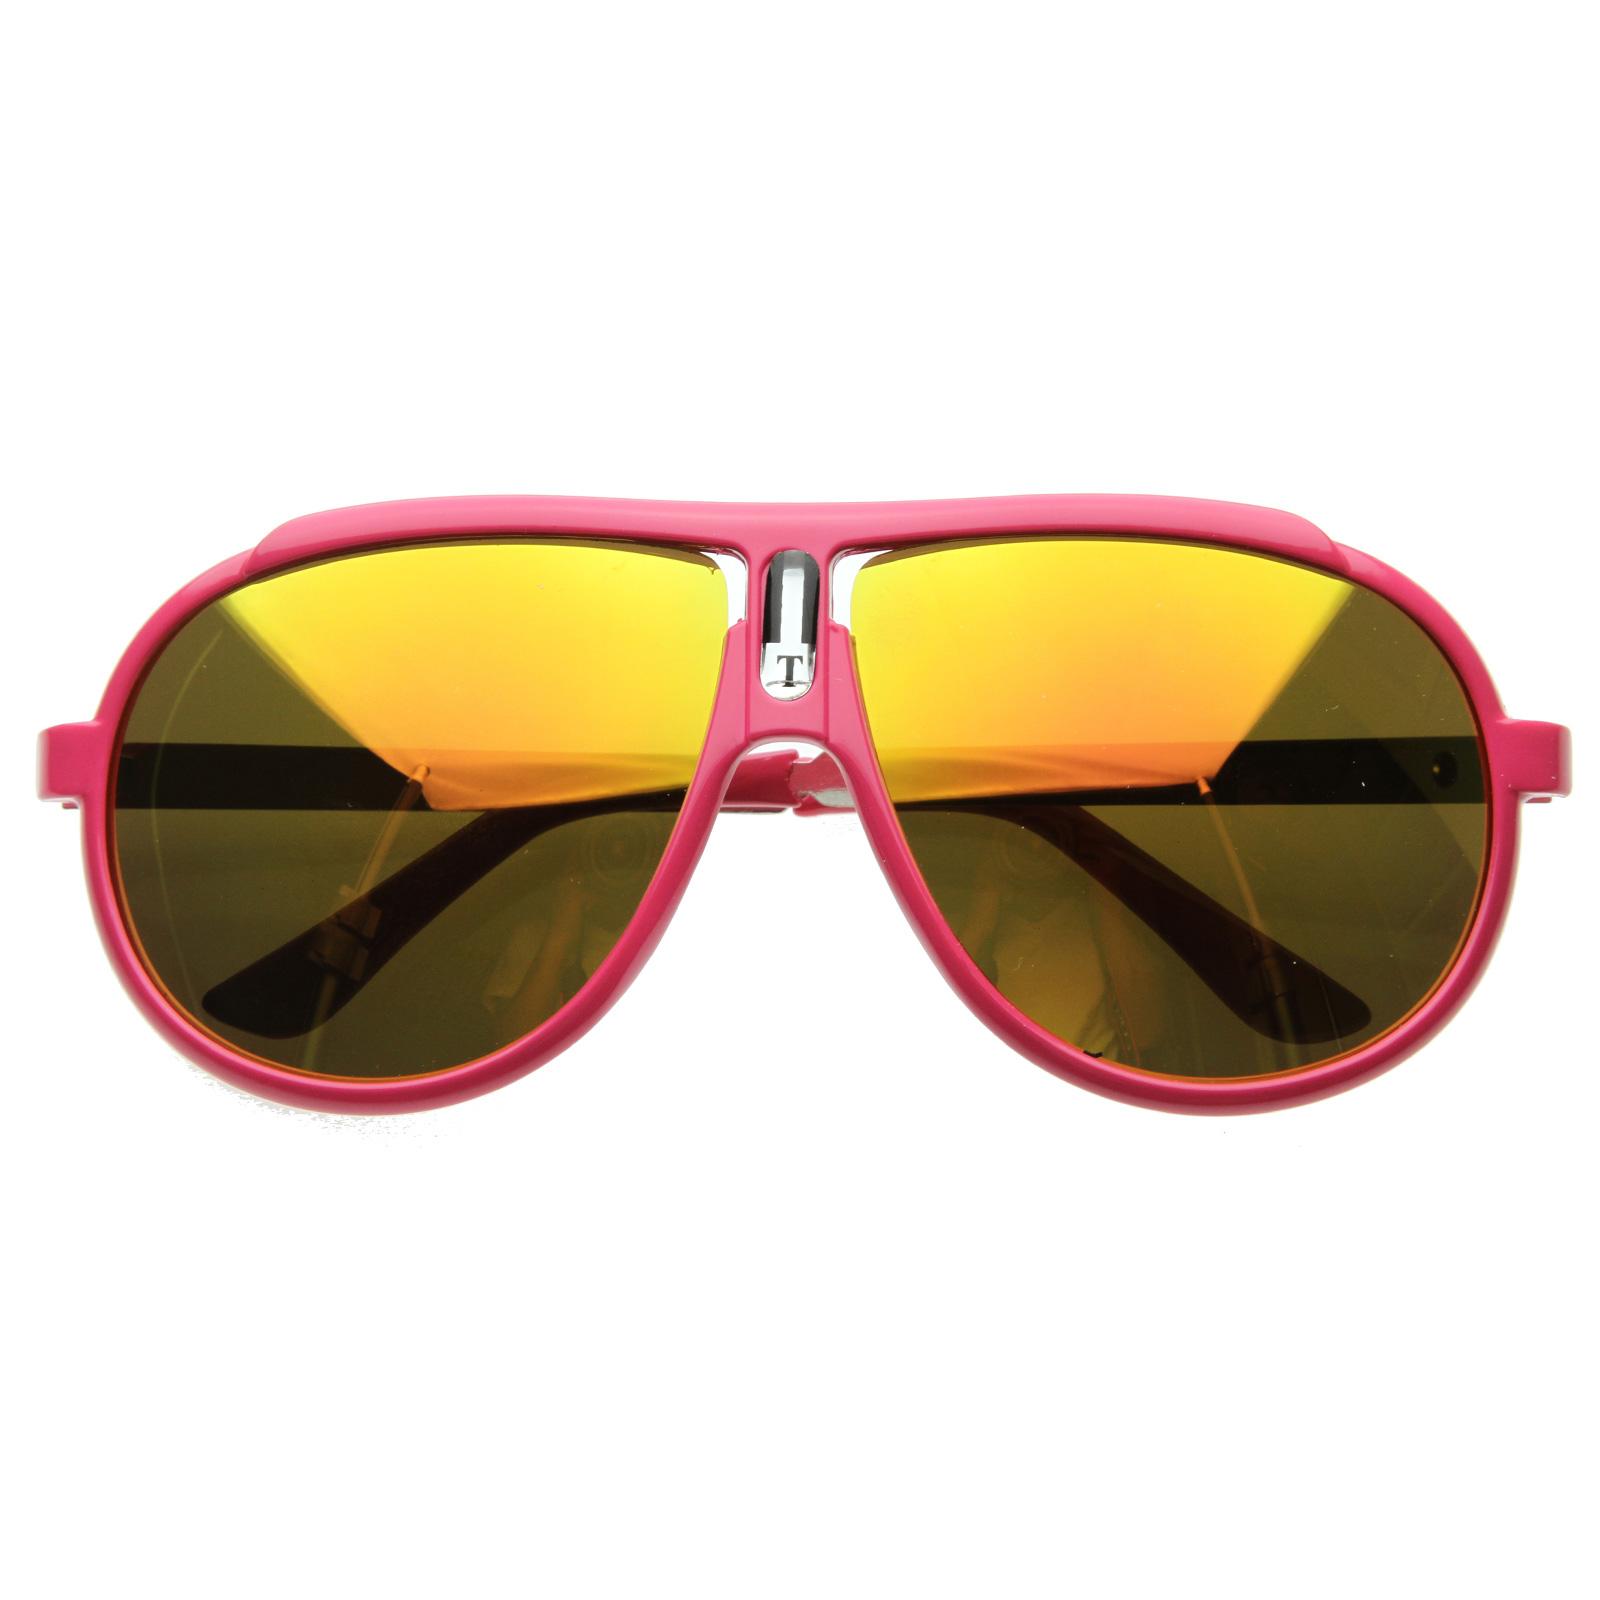 80s Retro Aviator Sunglasses Www Tapdance Org